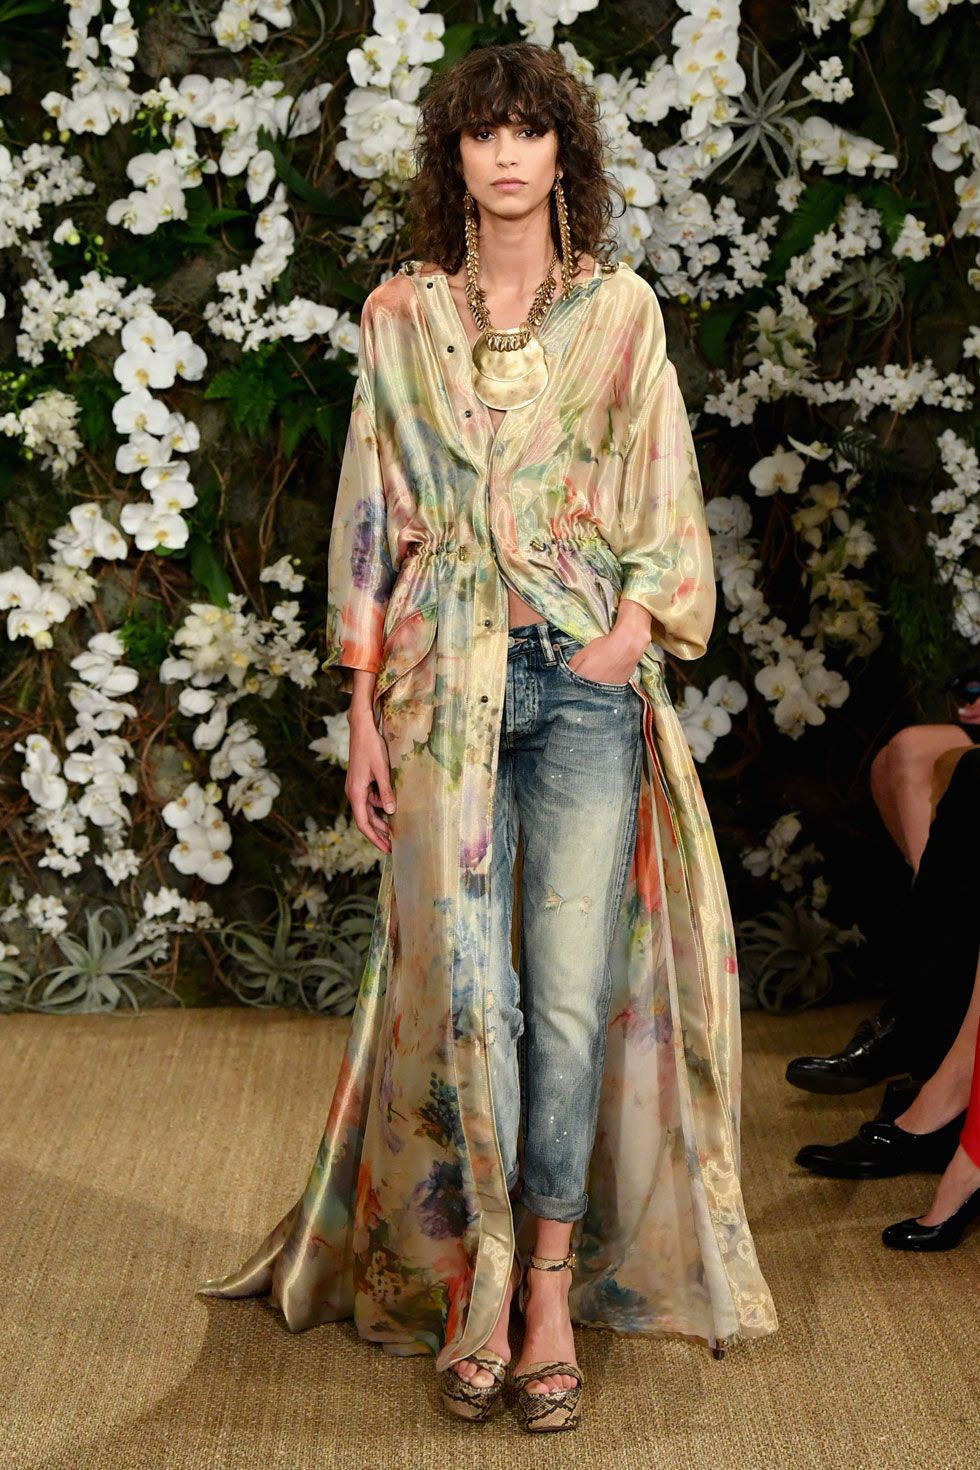 Clarissa Archer dress, gown formal wear colour outfit